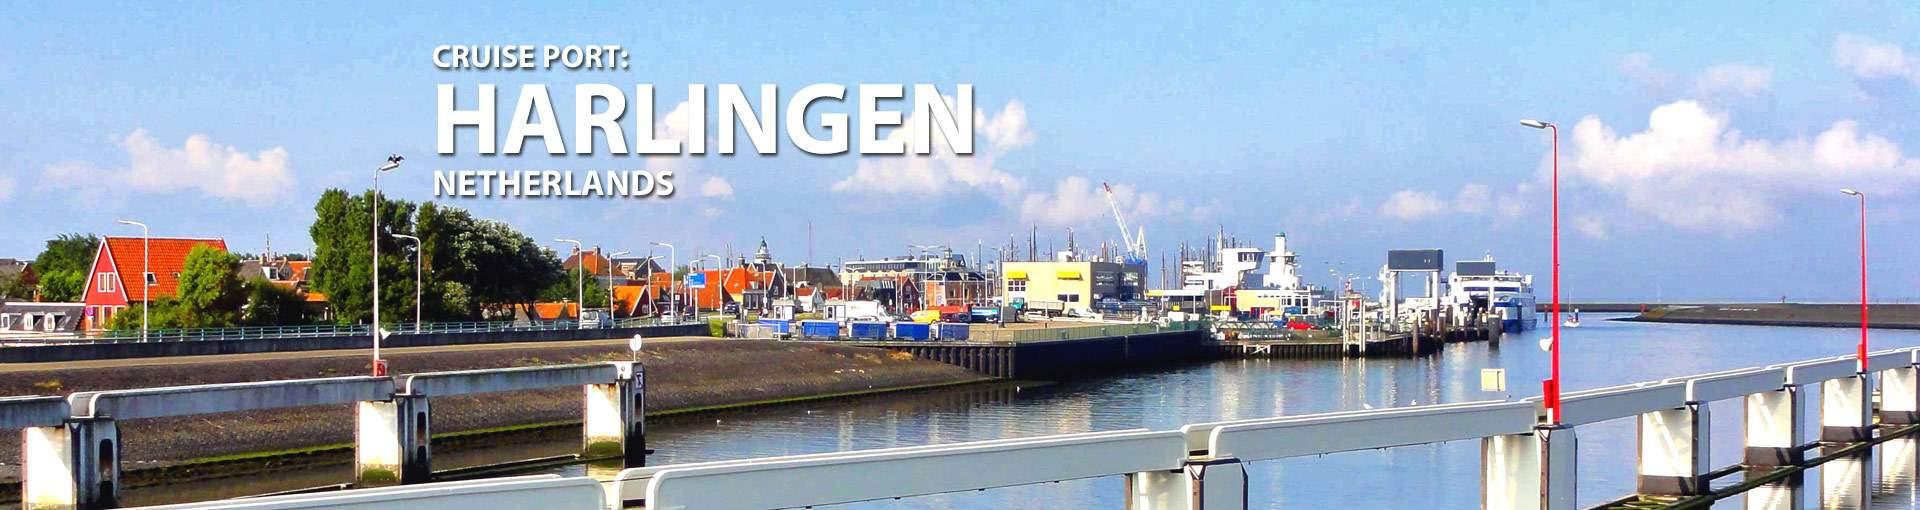 Harlingen, Netherlands Cruise Port